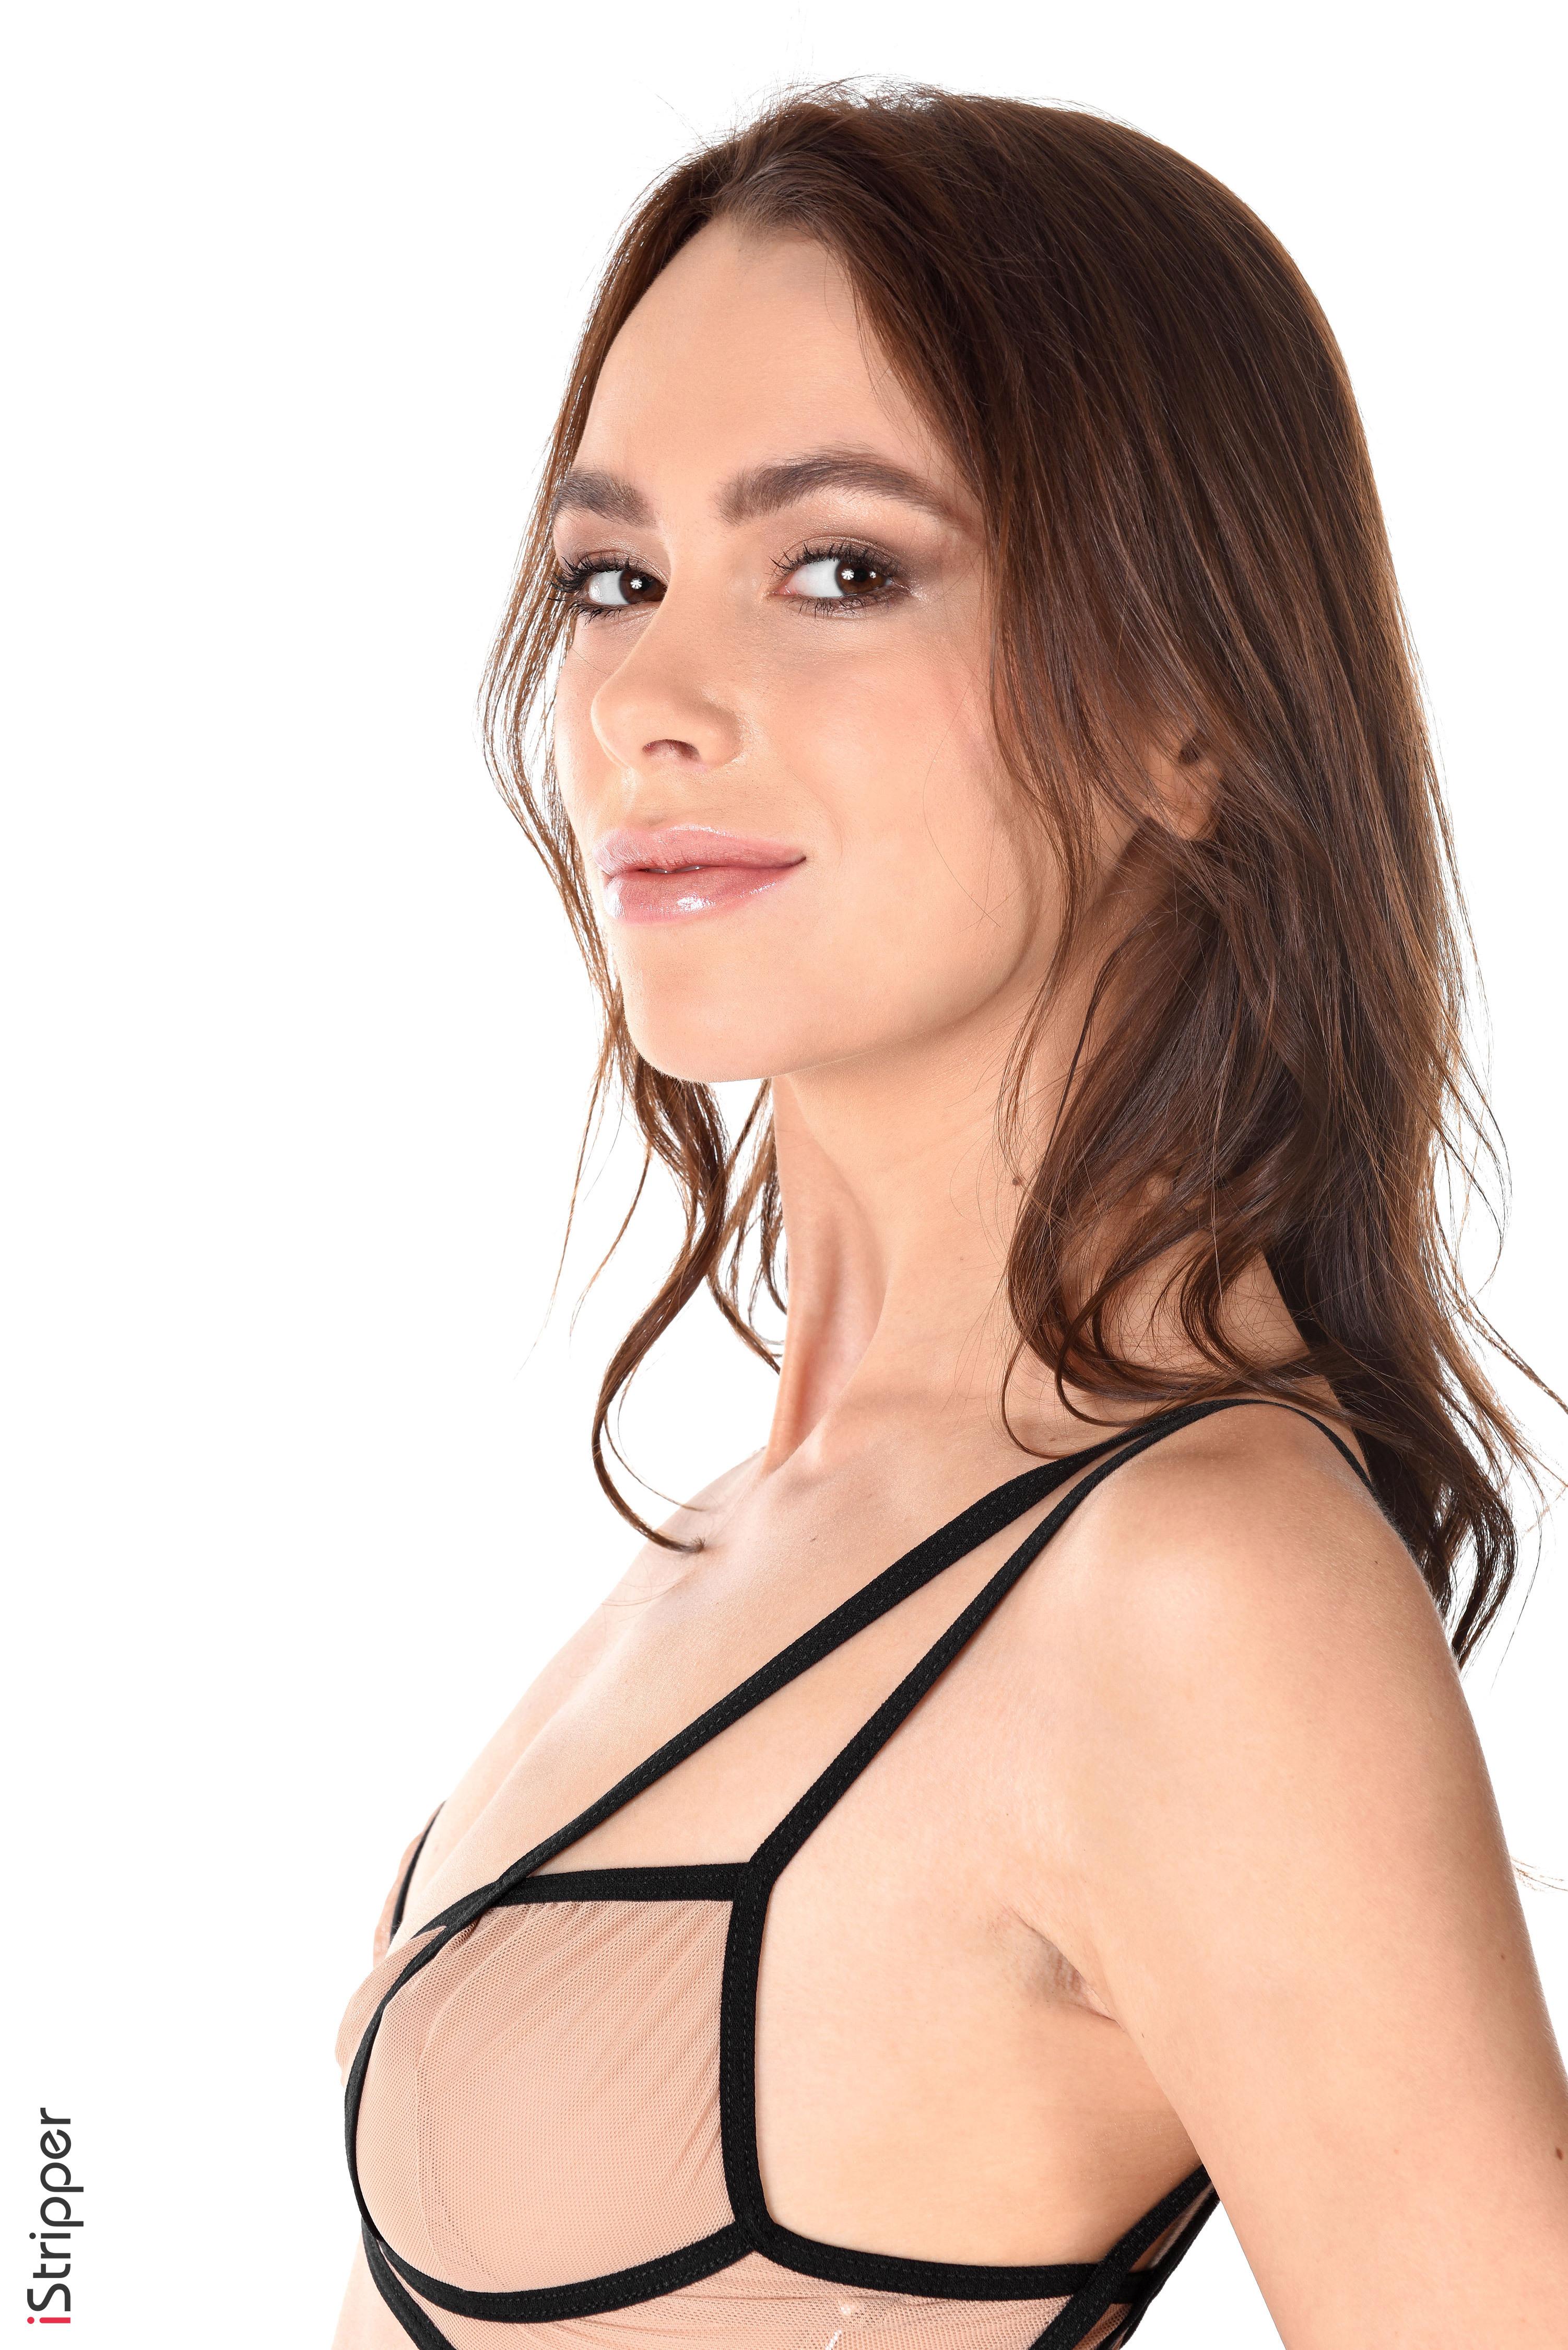 free Bare Busty Latina tittied beauty wallpapers